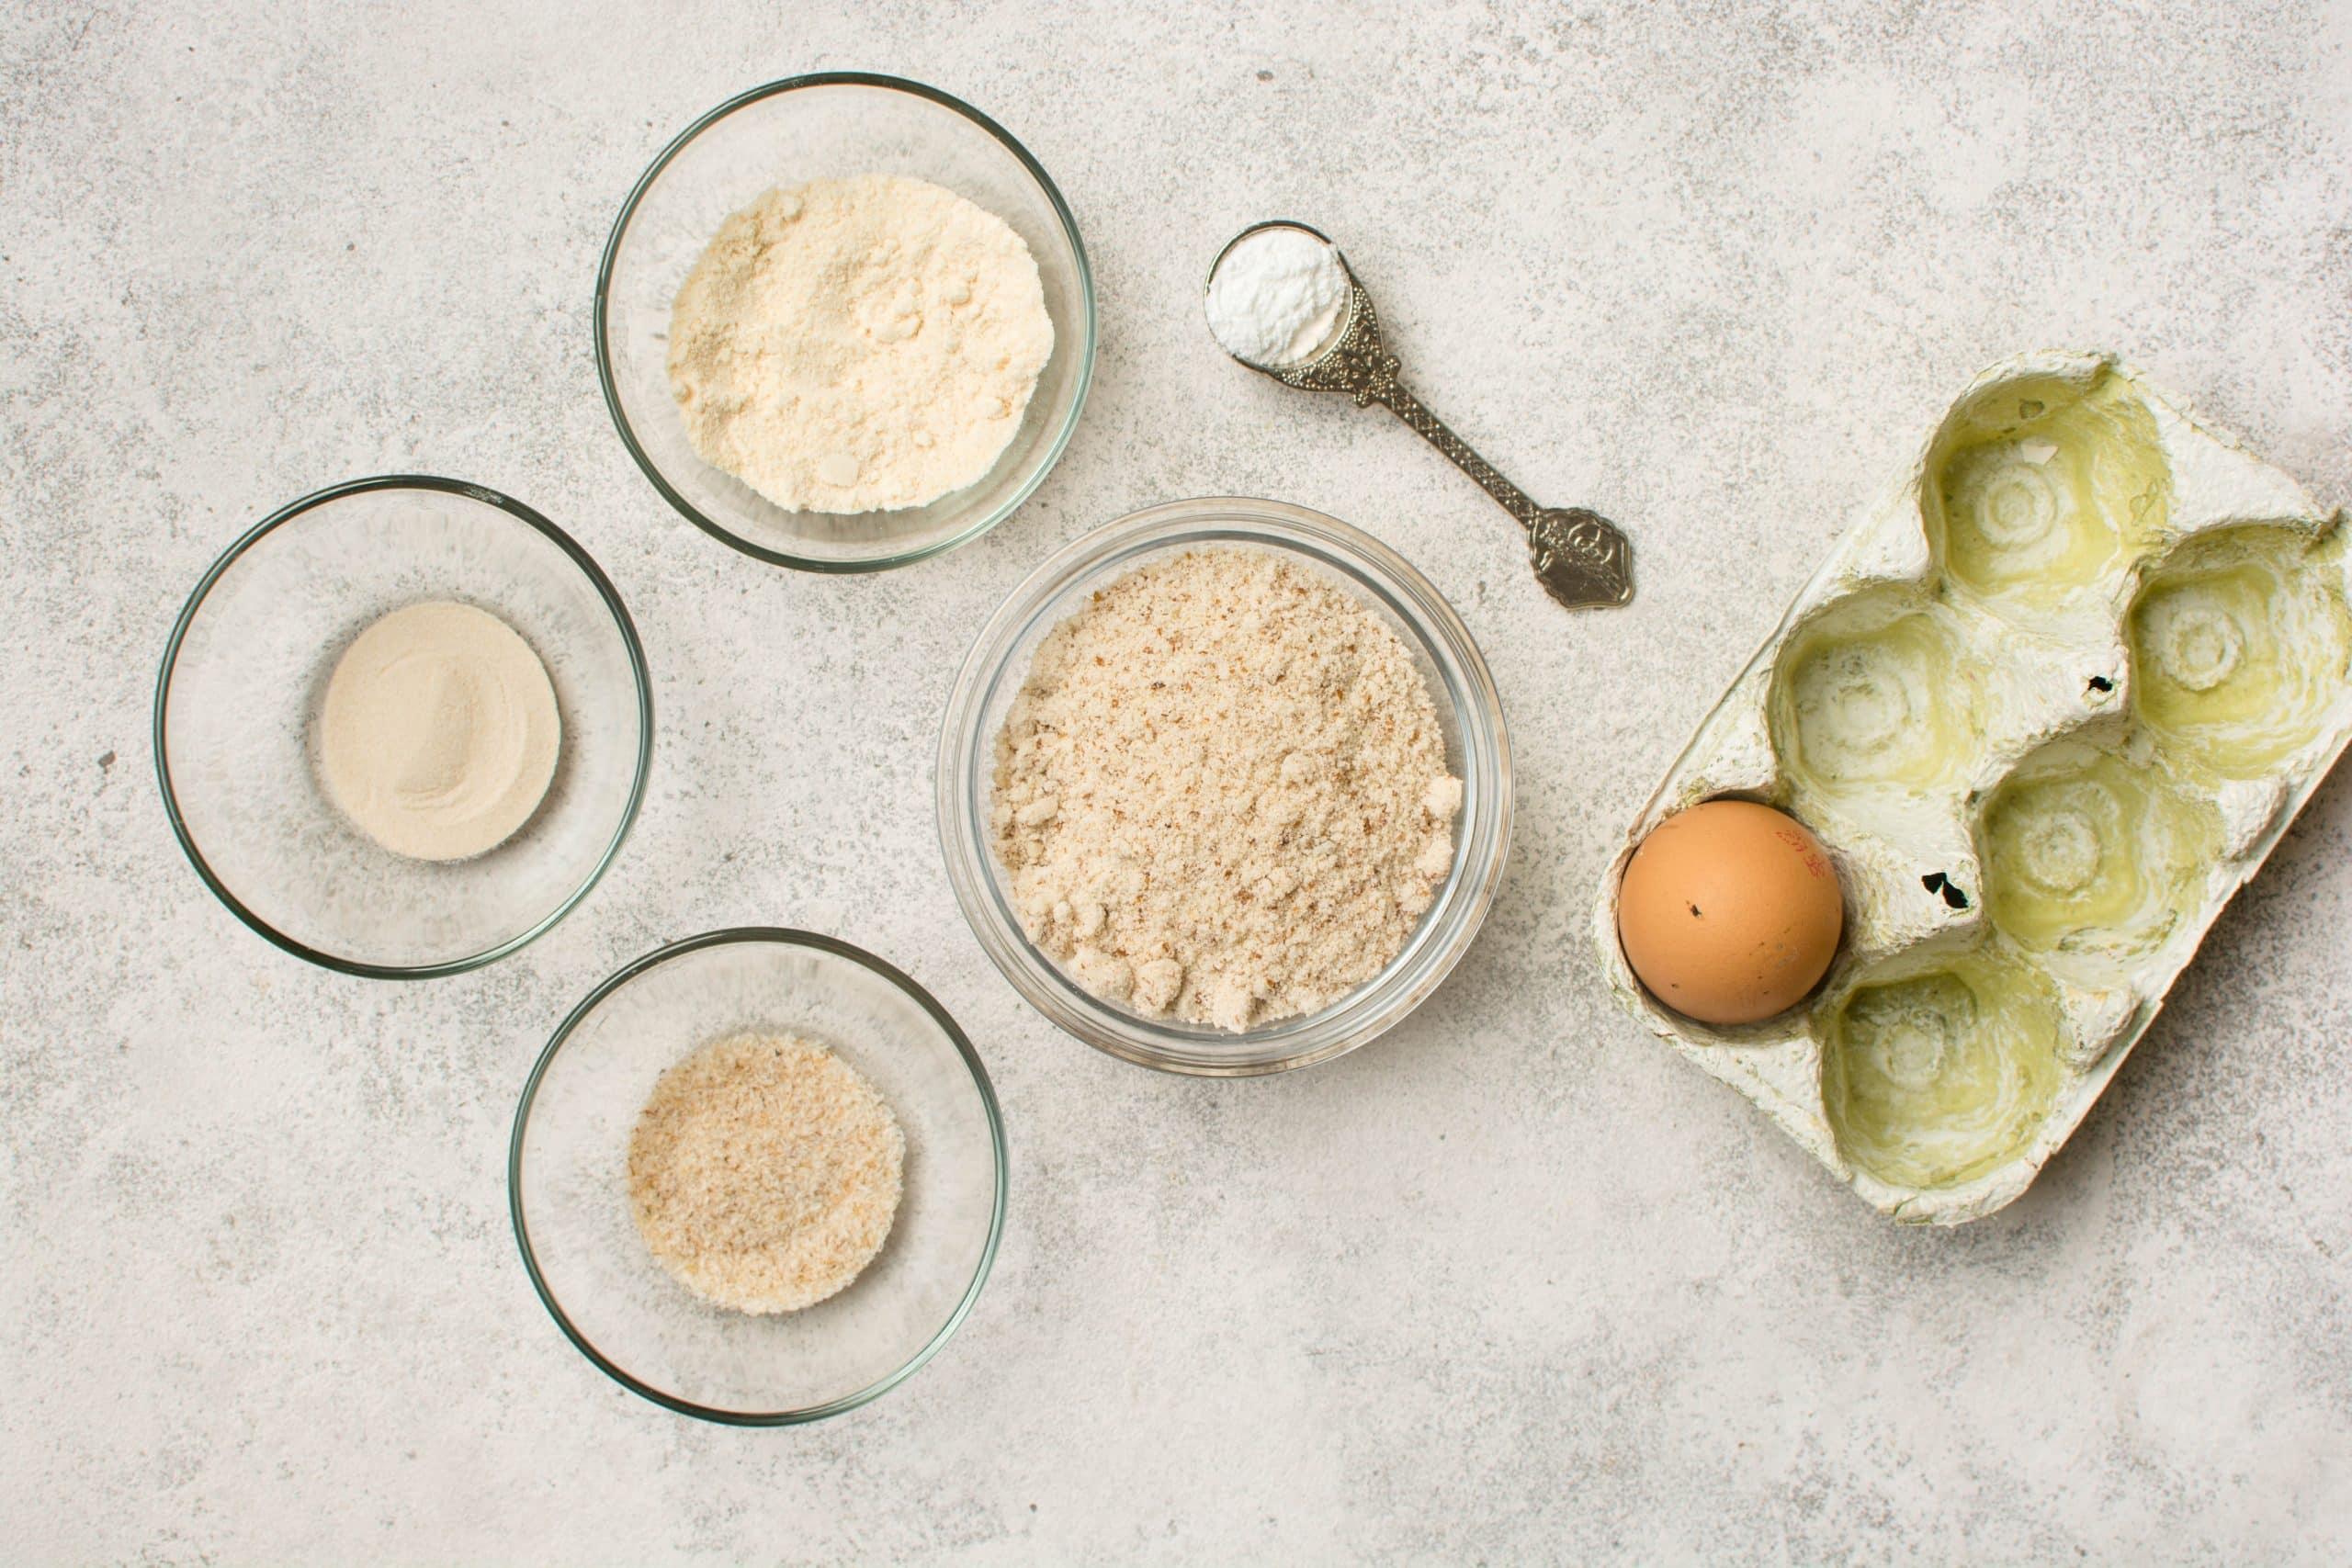 Tortilla Ingredients